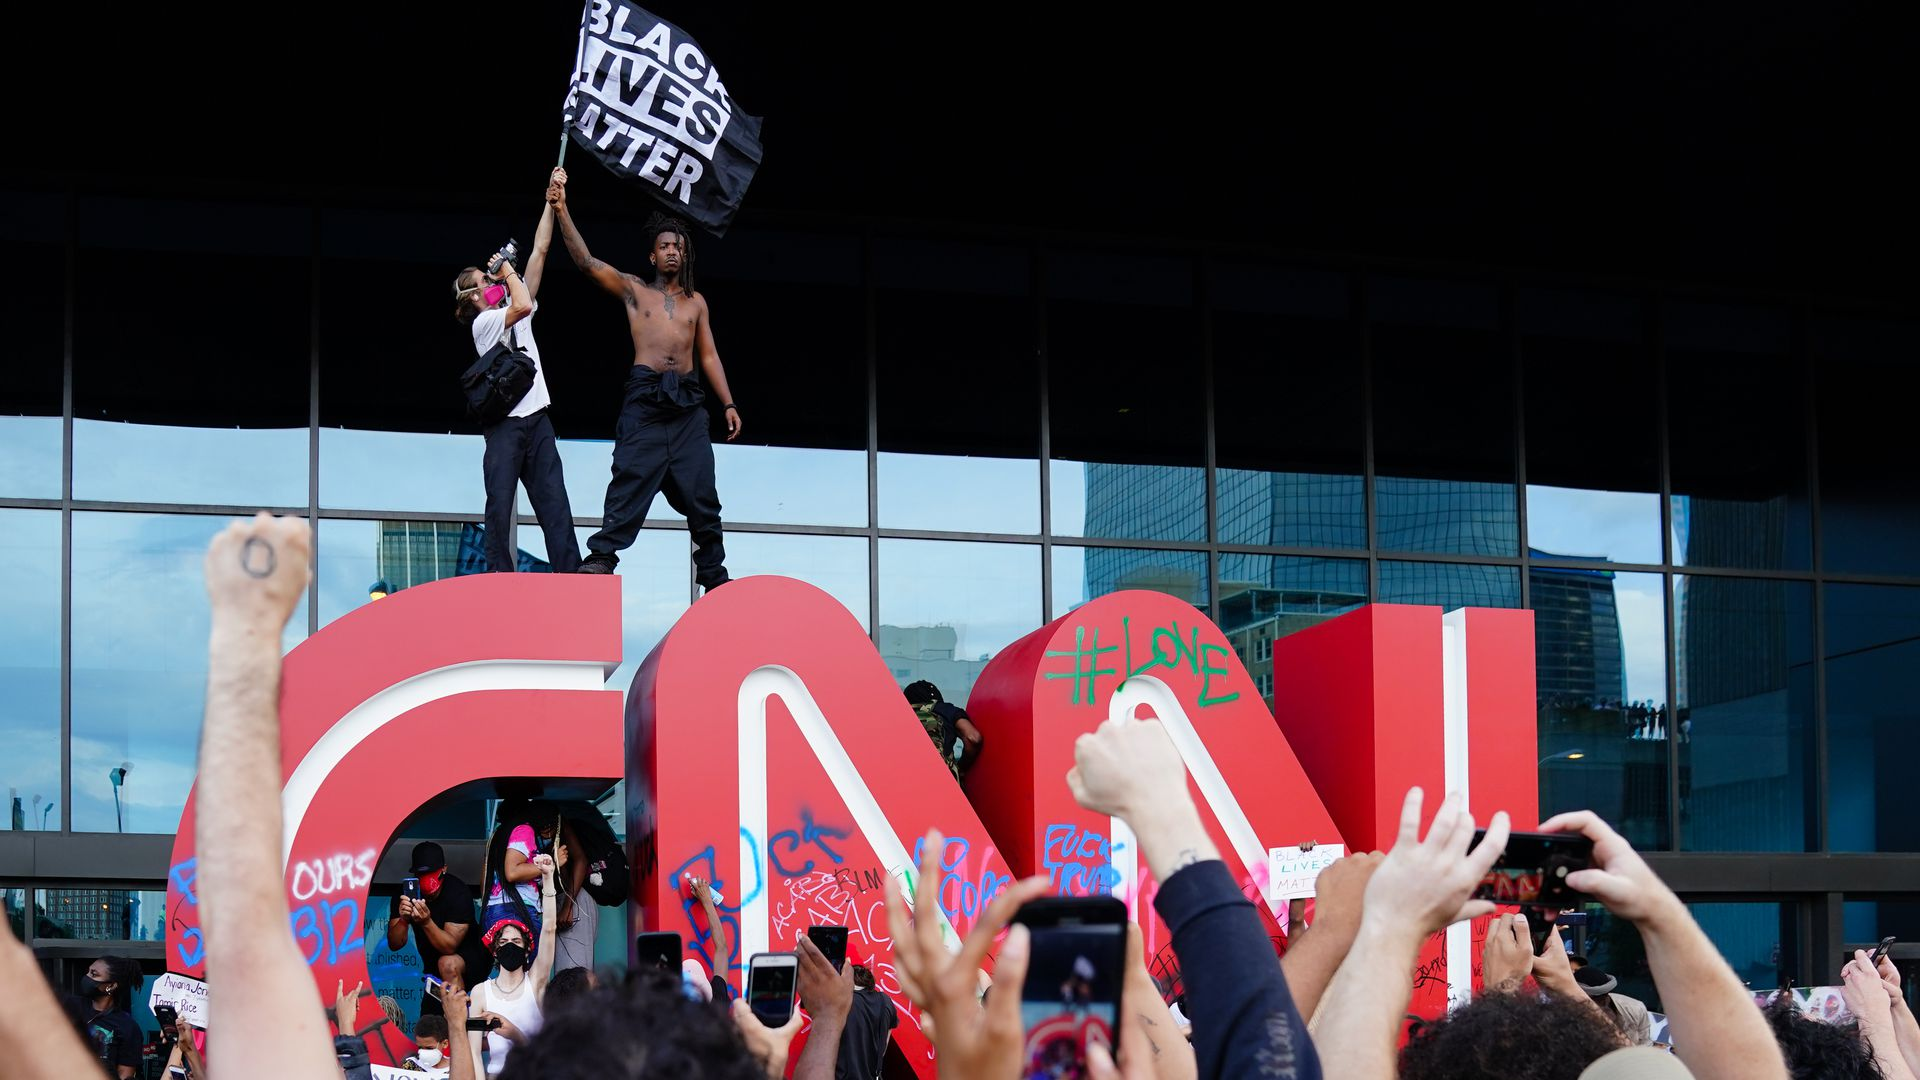 Black Lives Matter protest at CNN Headquarters in Atlanta, GA on May 29, 2020